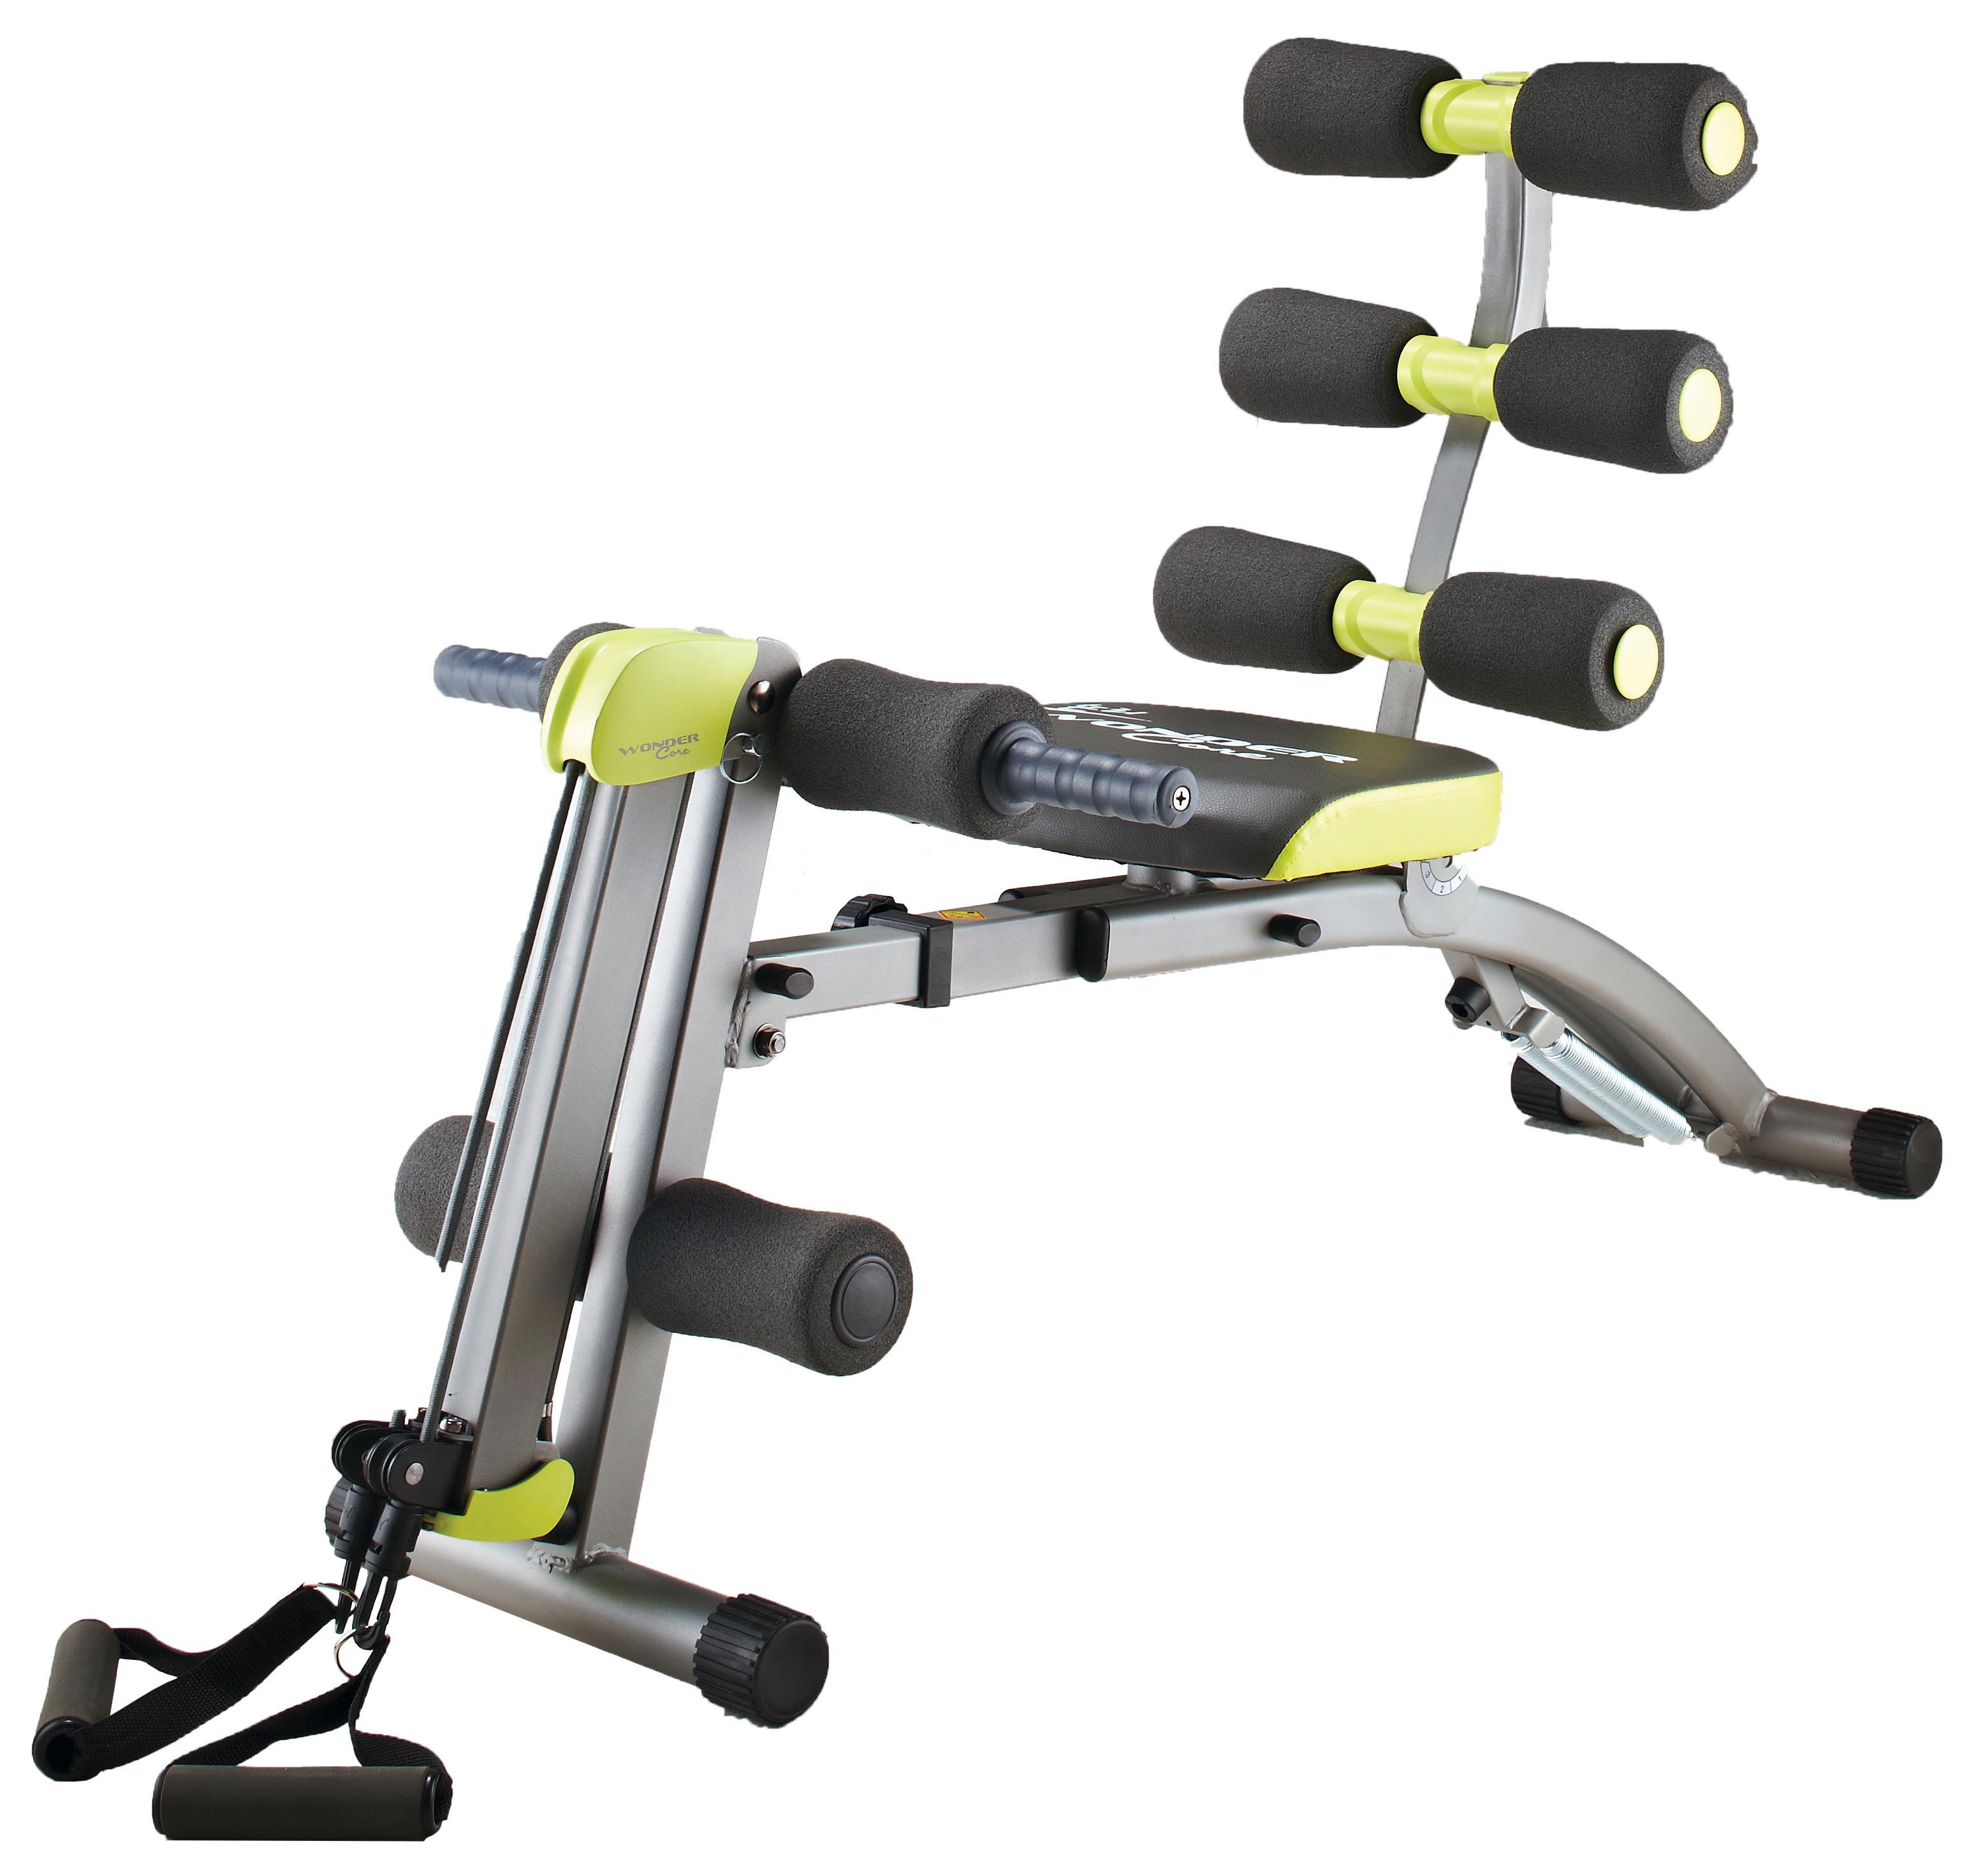 Wondercore Ii Unisex S Pro Rowing Set Attachment With 9 Kg